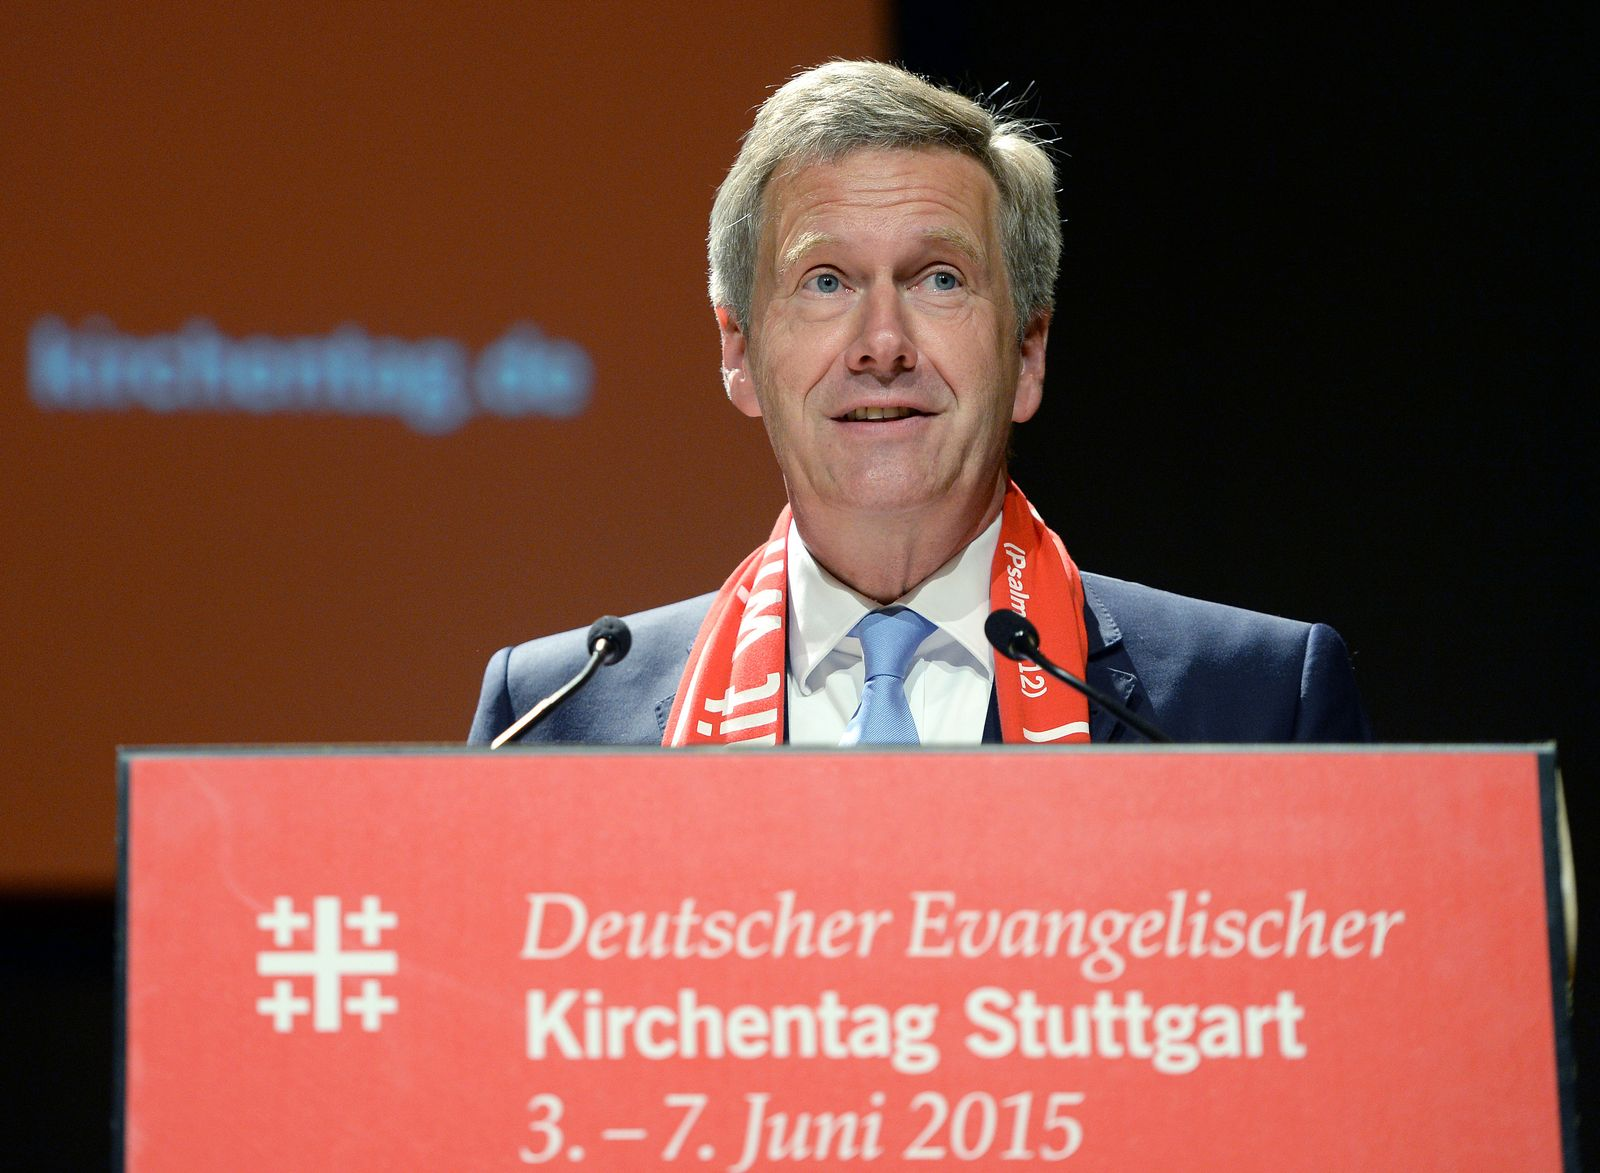 Christian Wulff / Kirchentag